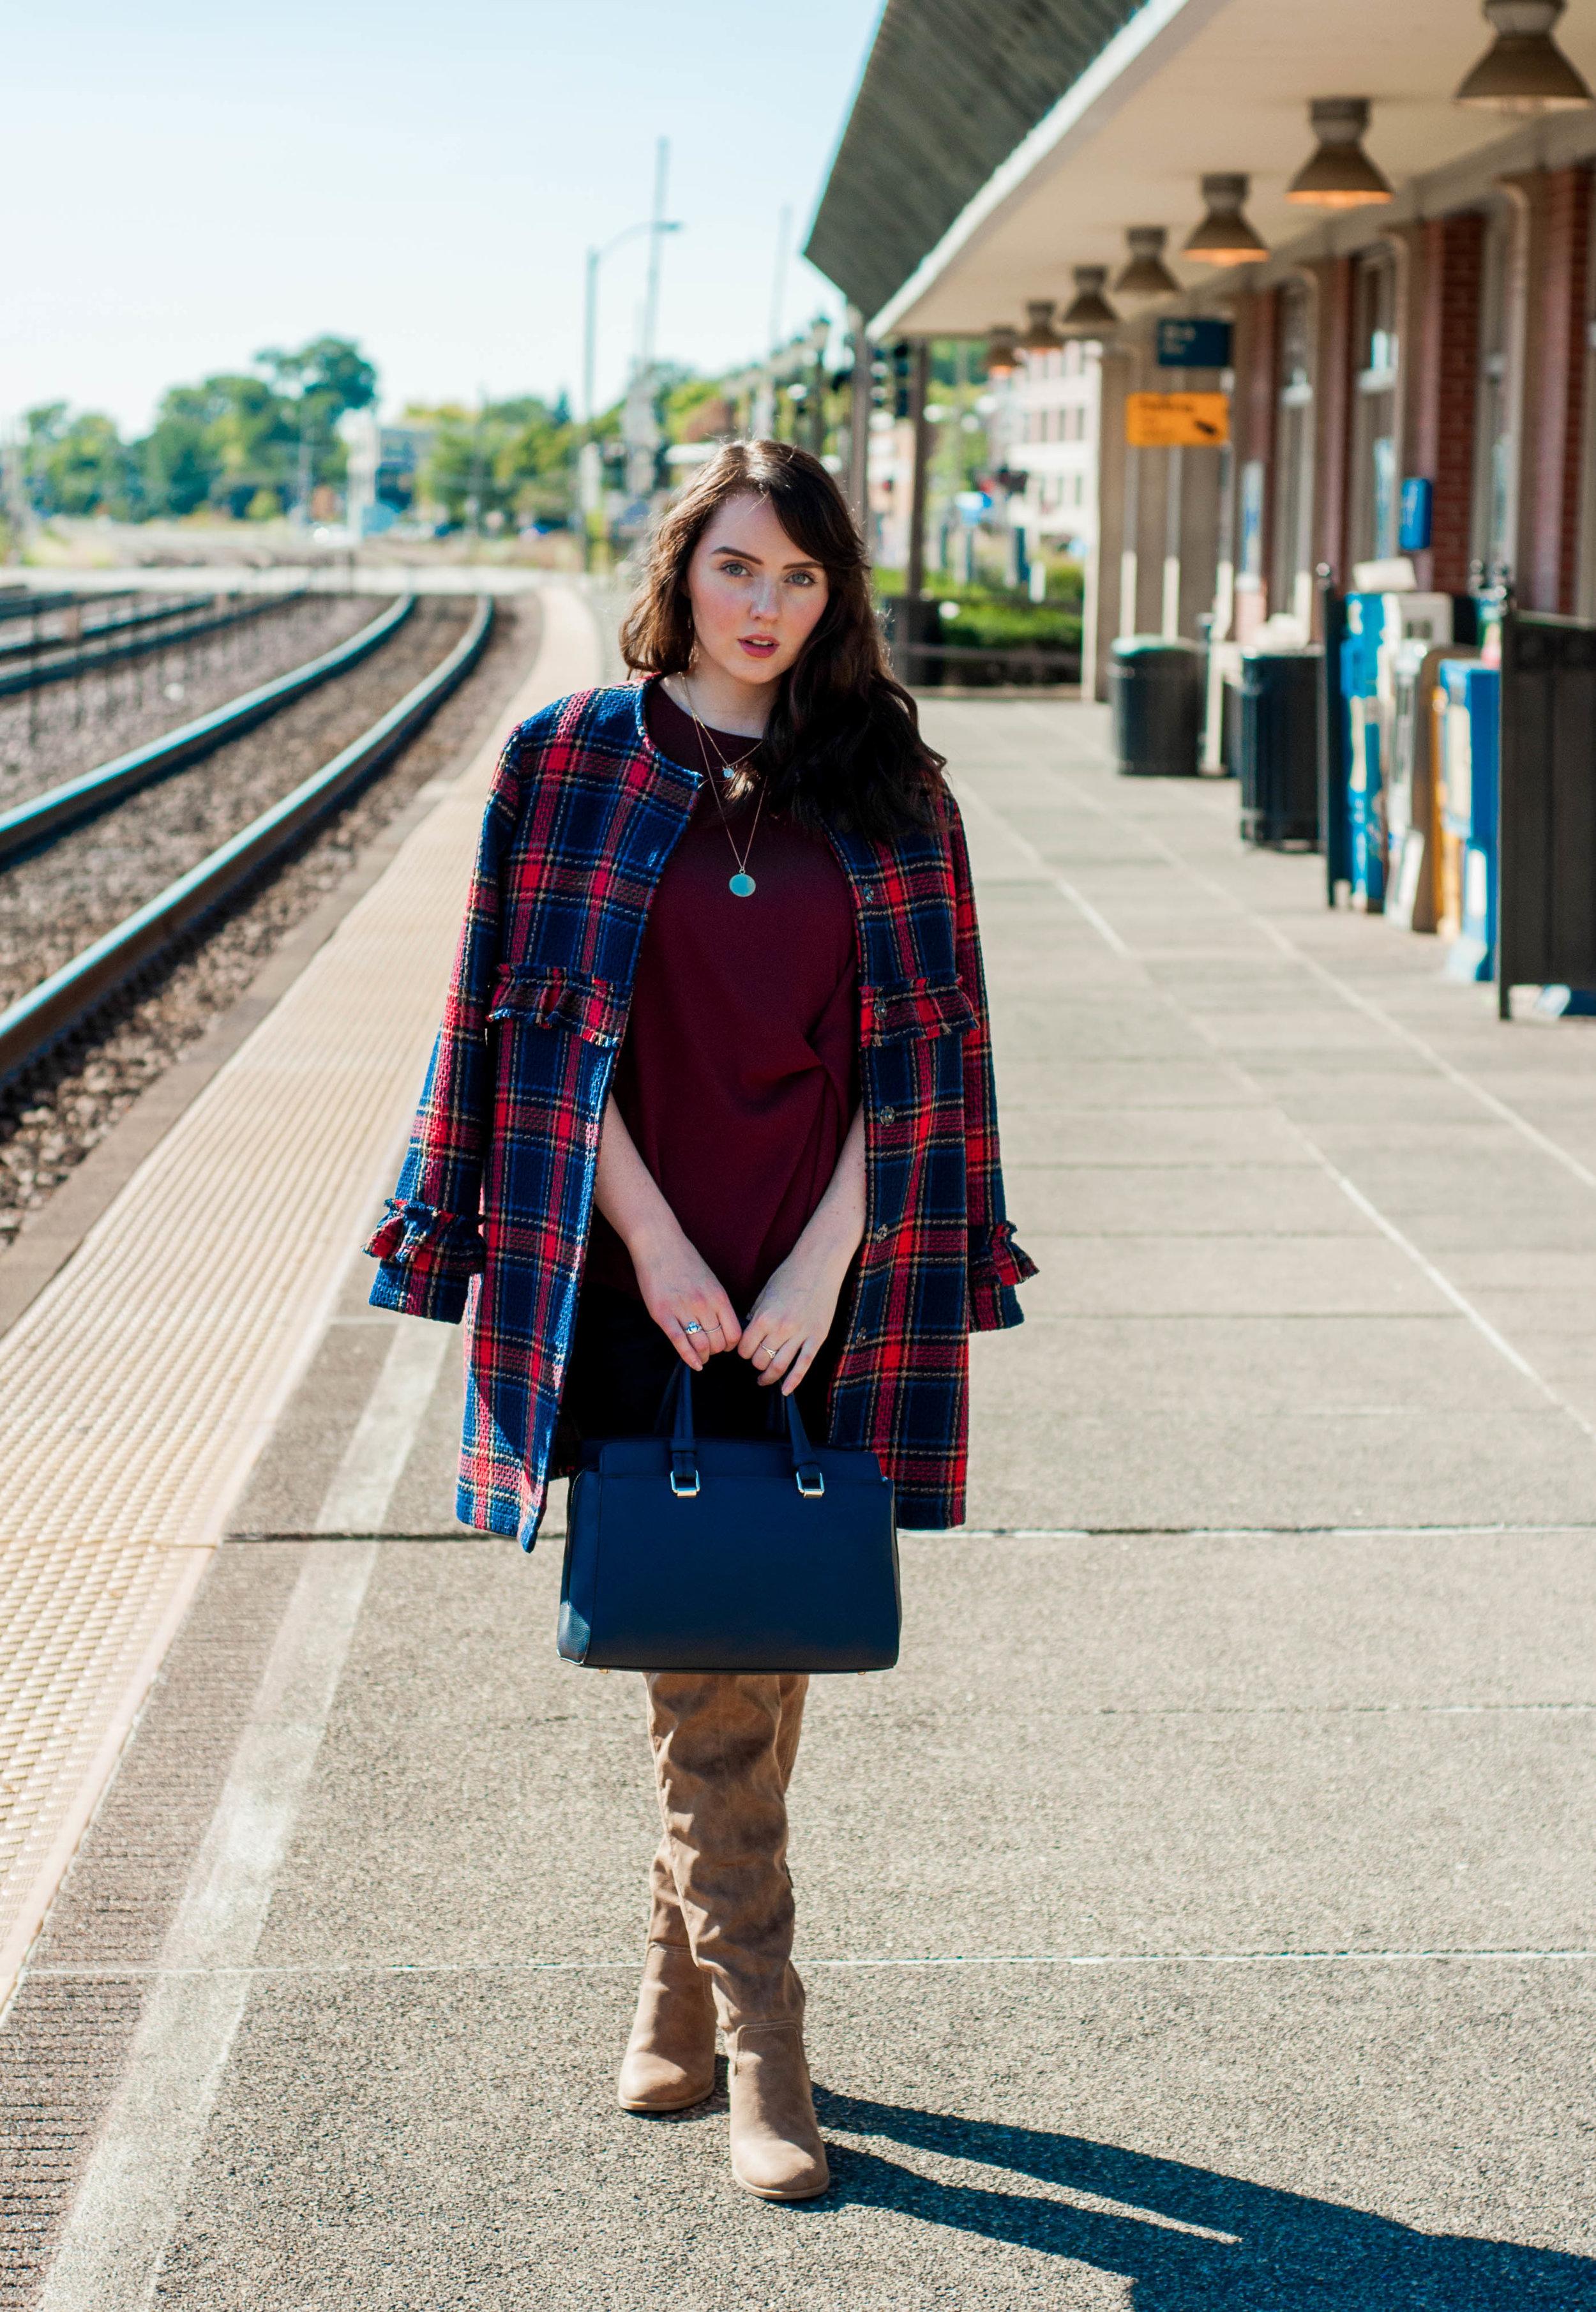 Macaila-Britton-Chicago-Fashion-Model